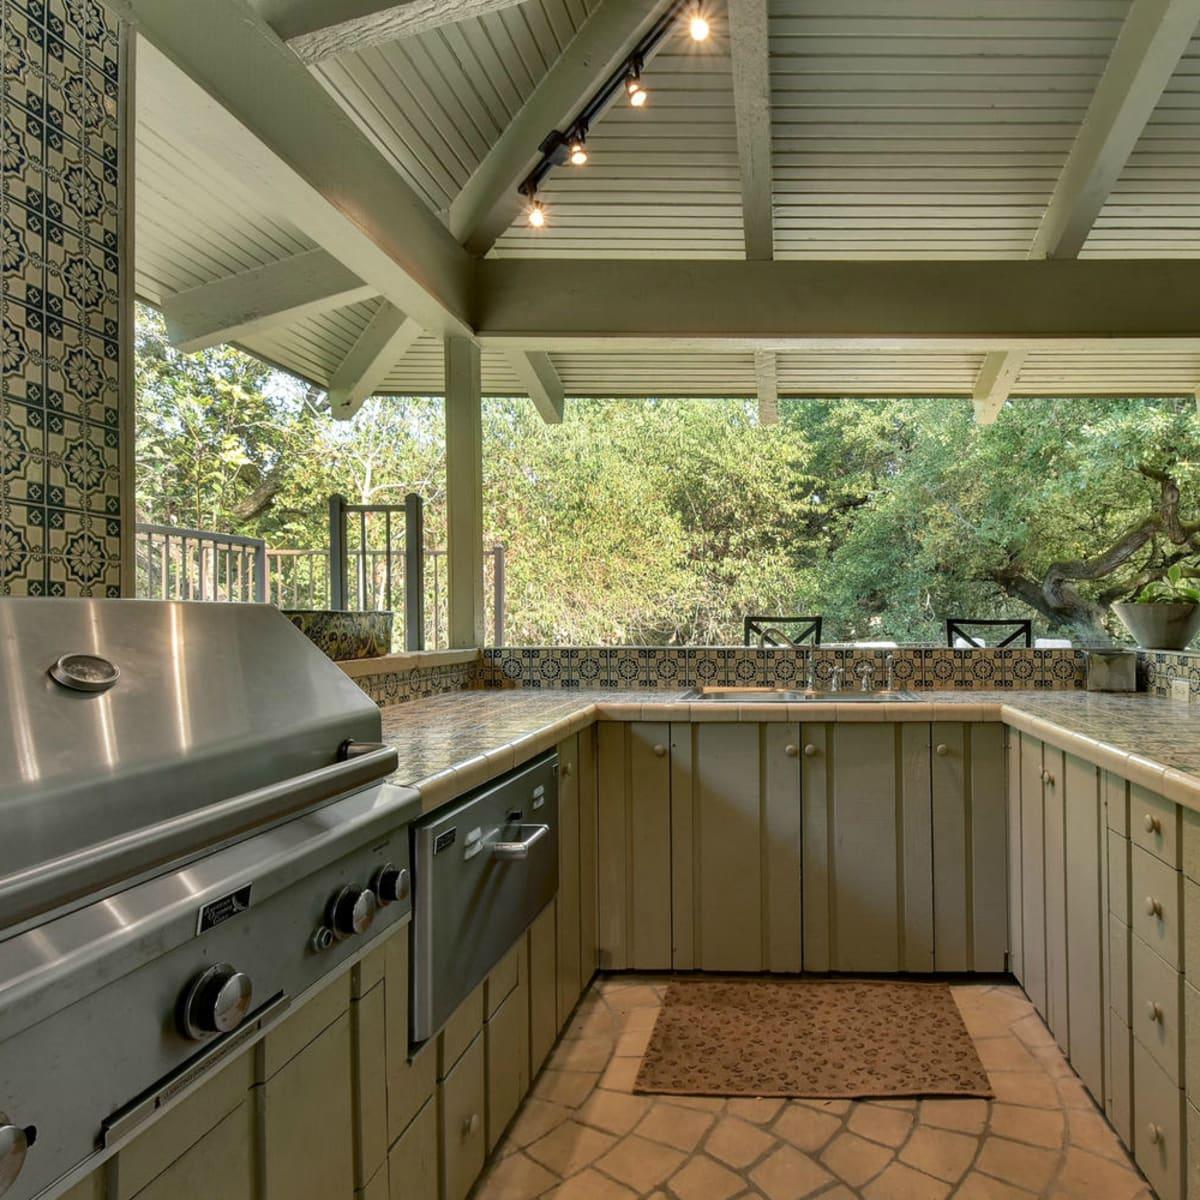 Austin house home Tarrytown 2610 Kenmore Court Ben Crenshaw February 2016 outdoor kitchen